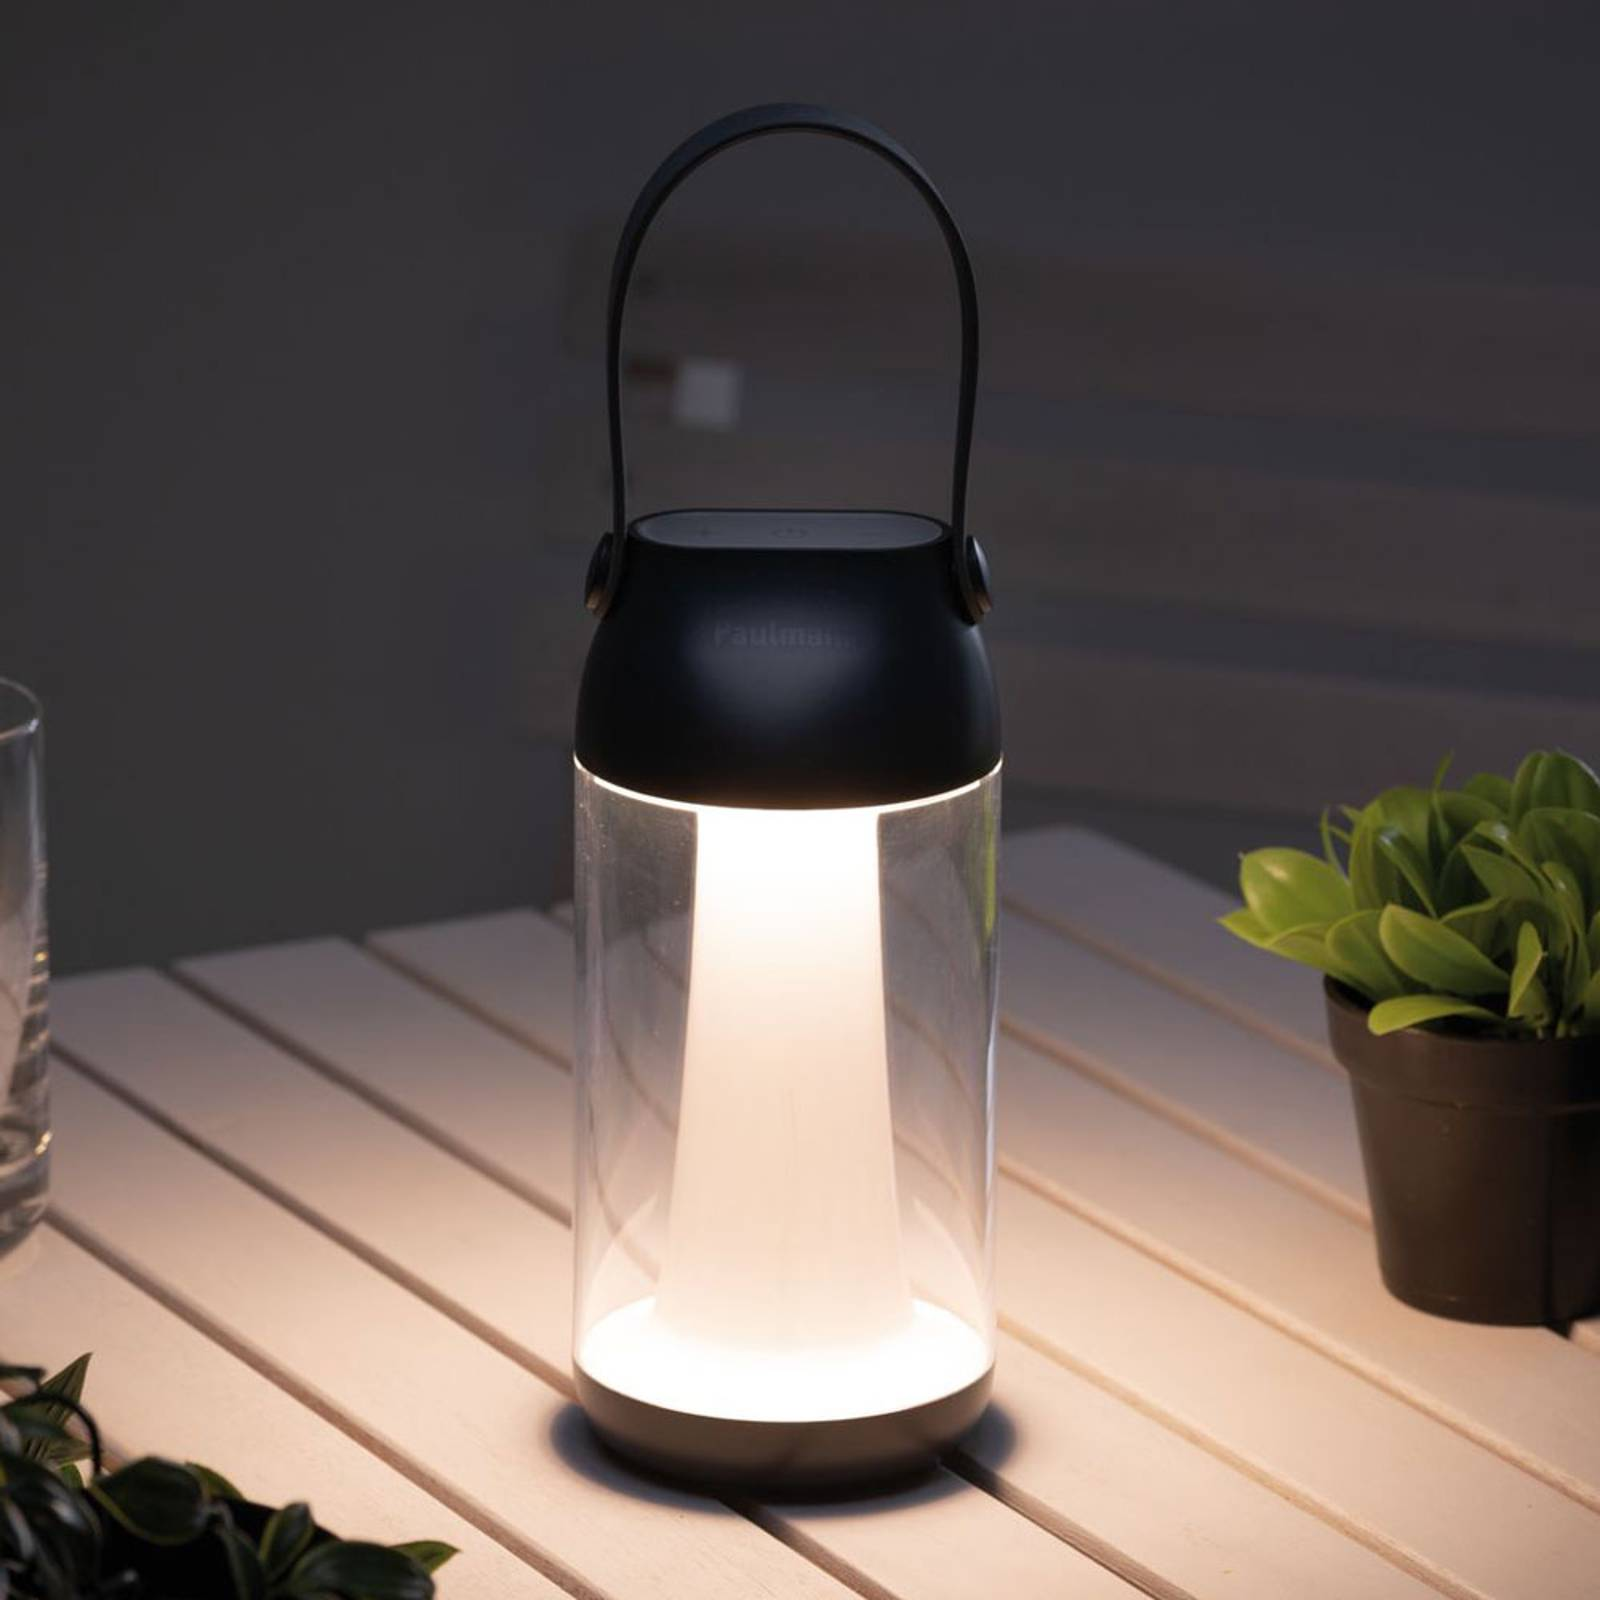 Paulmann LED-Camping-valaisin Capulino